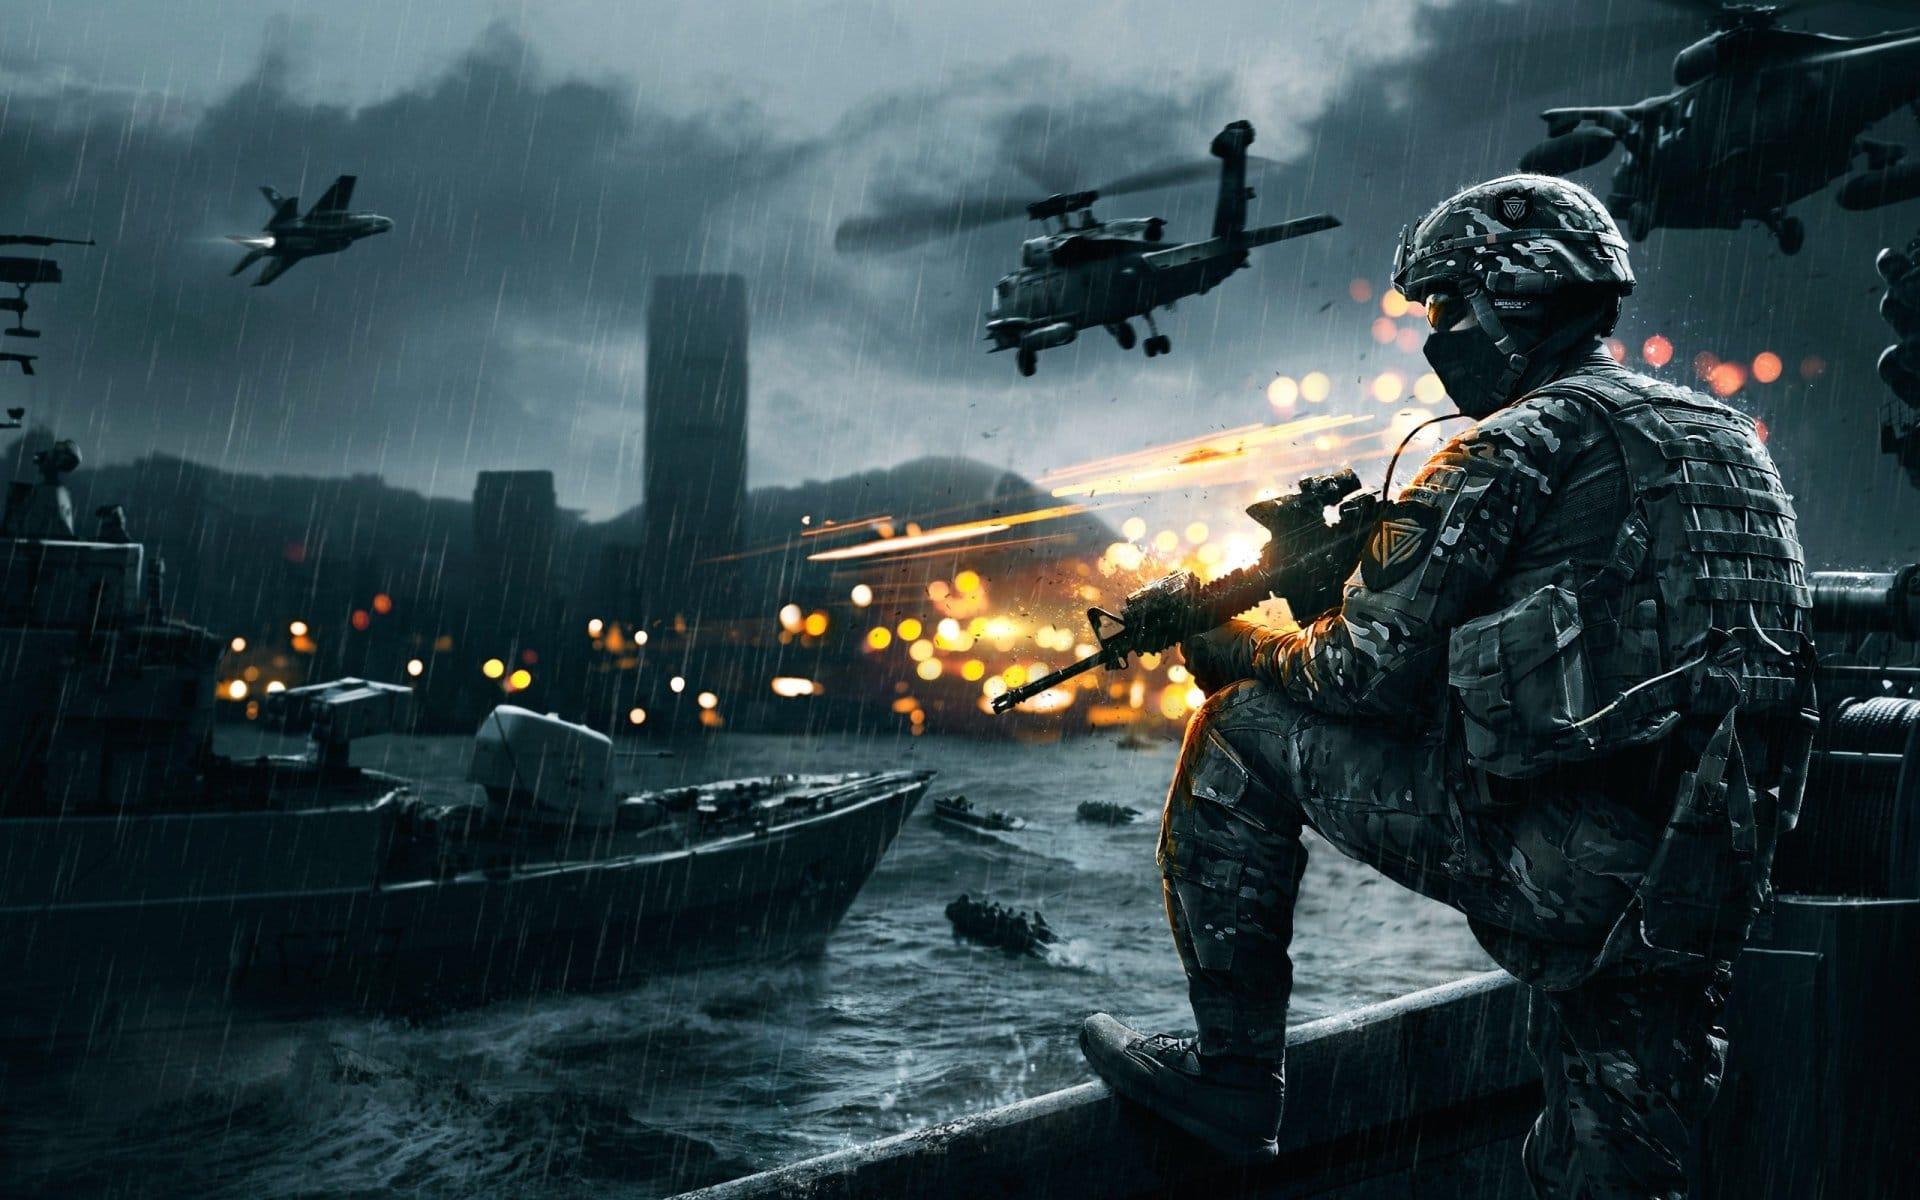 Audeze Mobius Review Battlefield